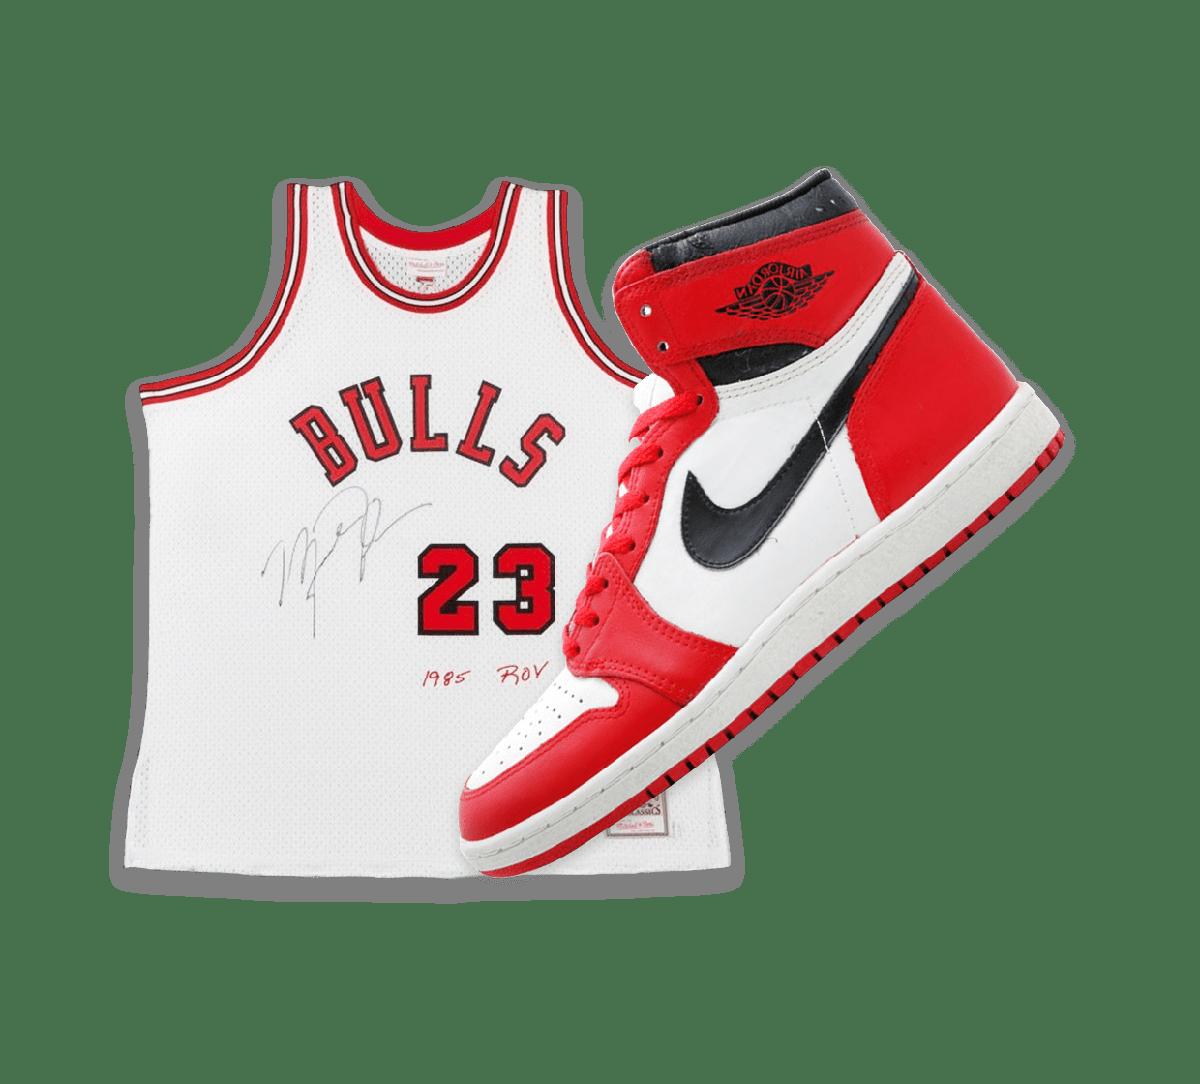 The 1985 Michael Jordan Collection Image